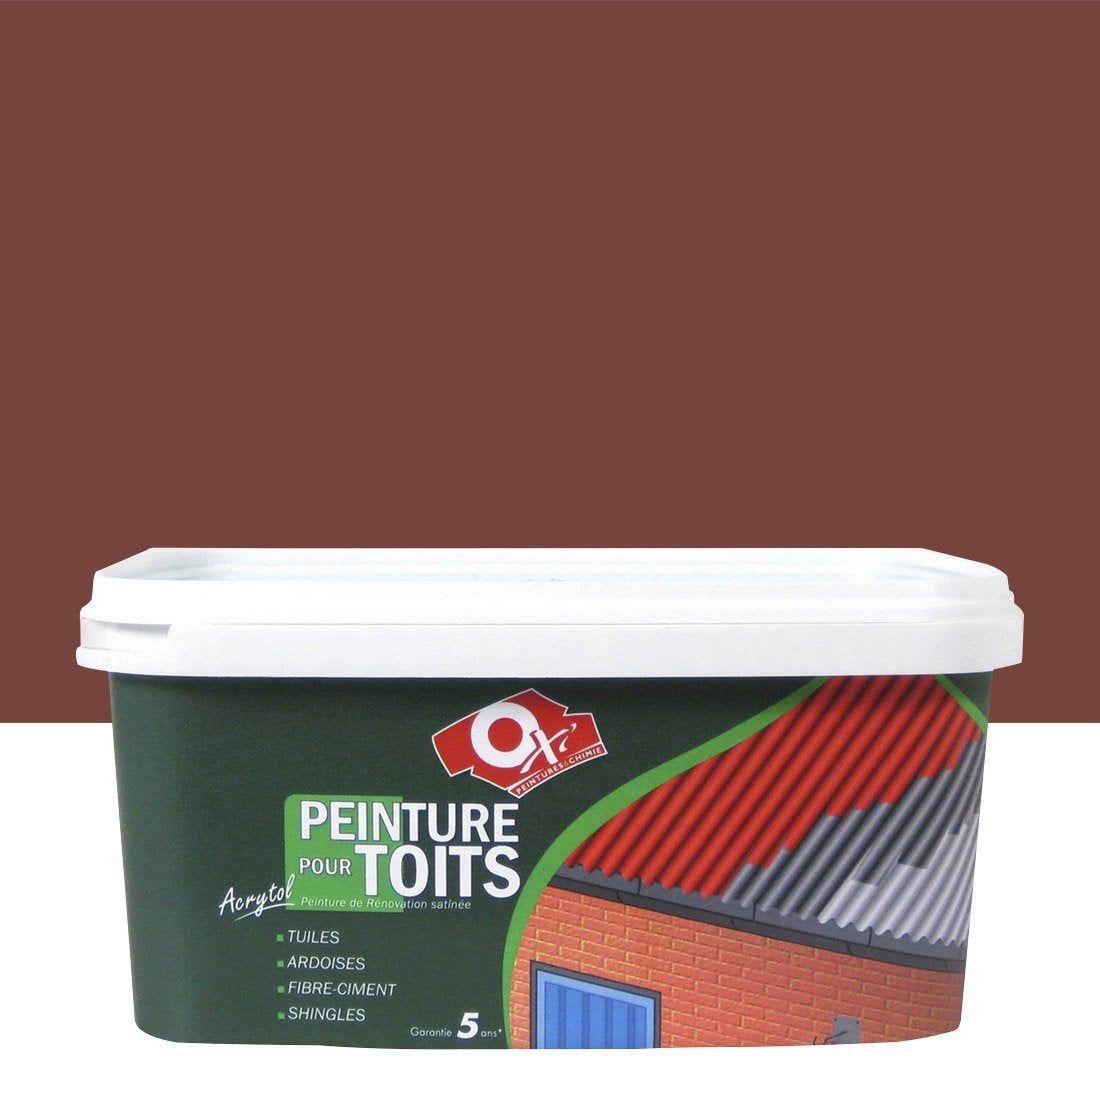 Peinture Toiture Exterieur Acrytol Oxytol Rouge 2 5 L Oxi Peinture Toiture Toiture Et Fibre Ciment